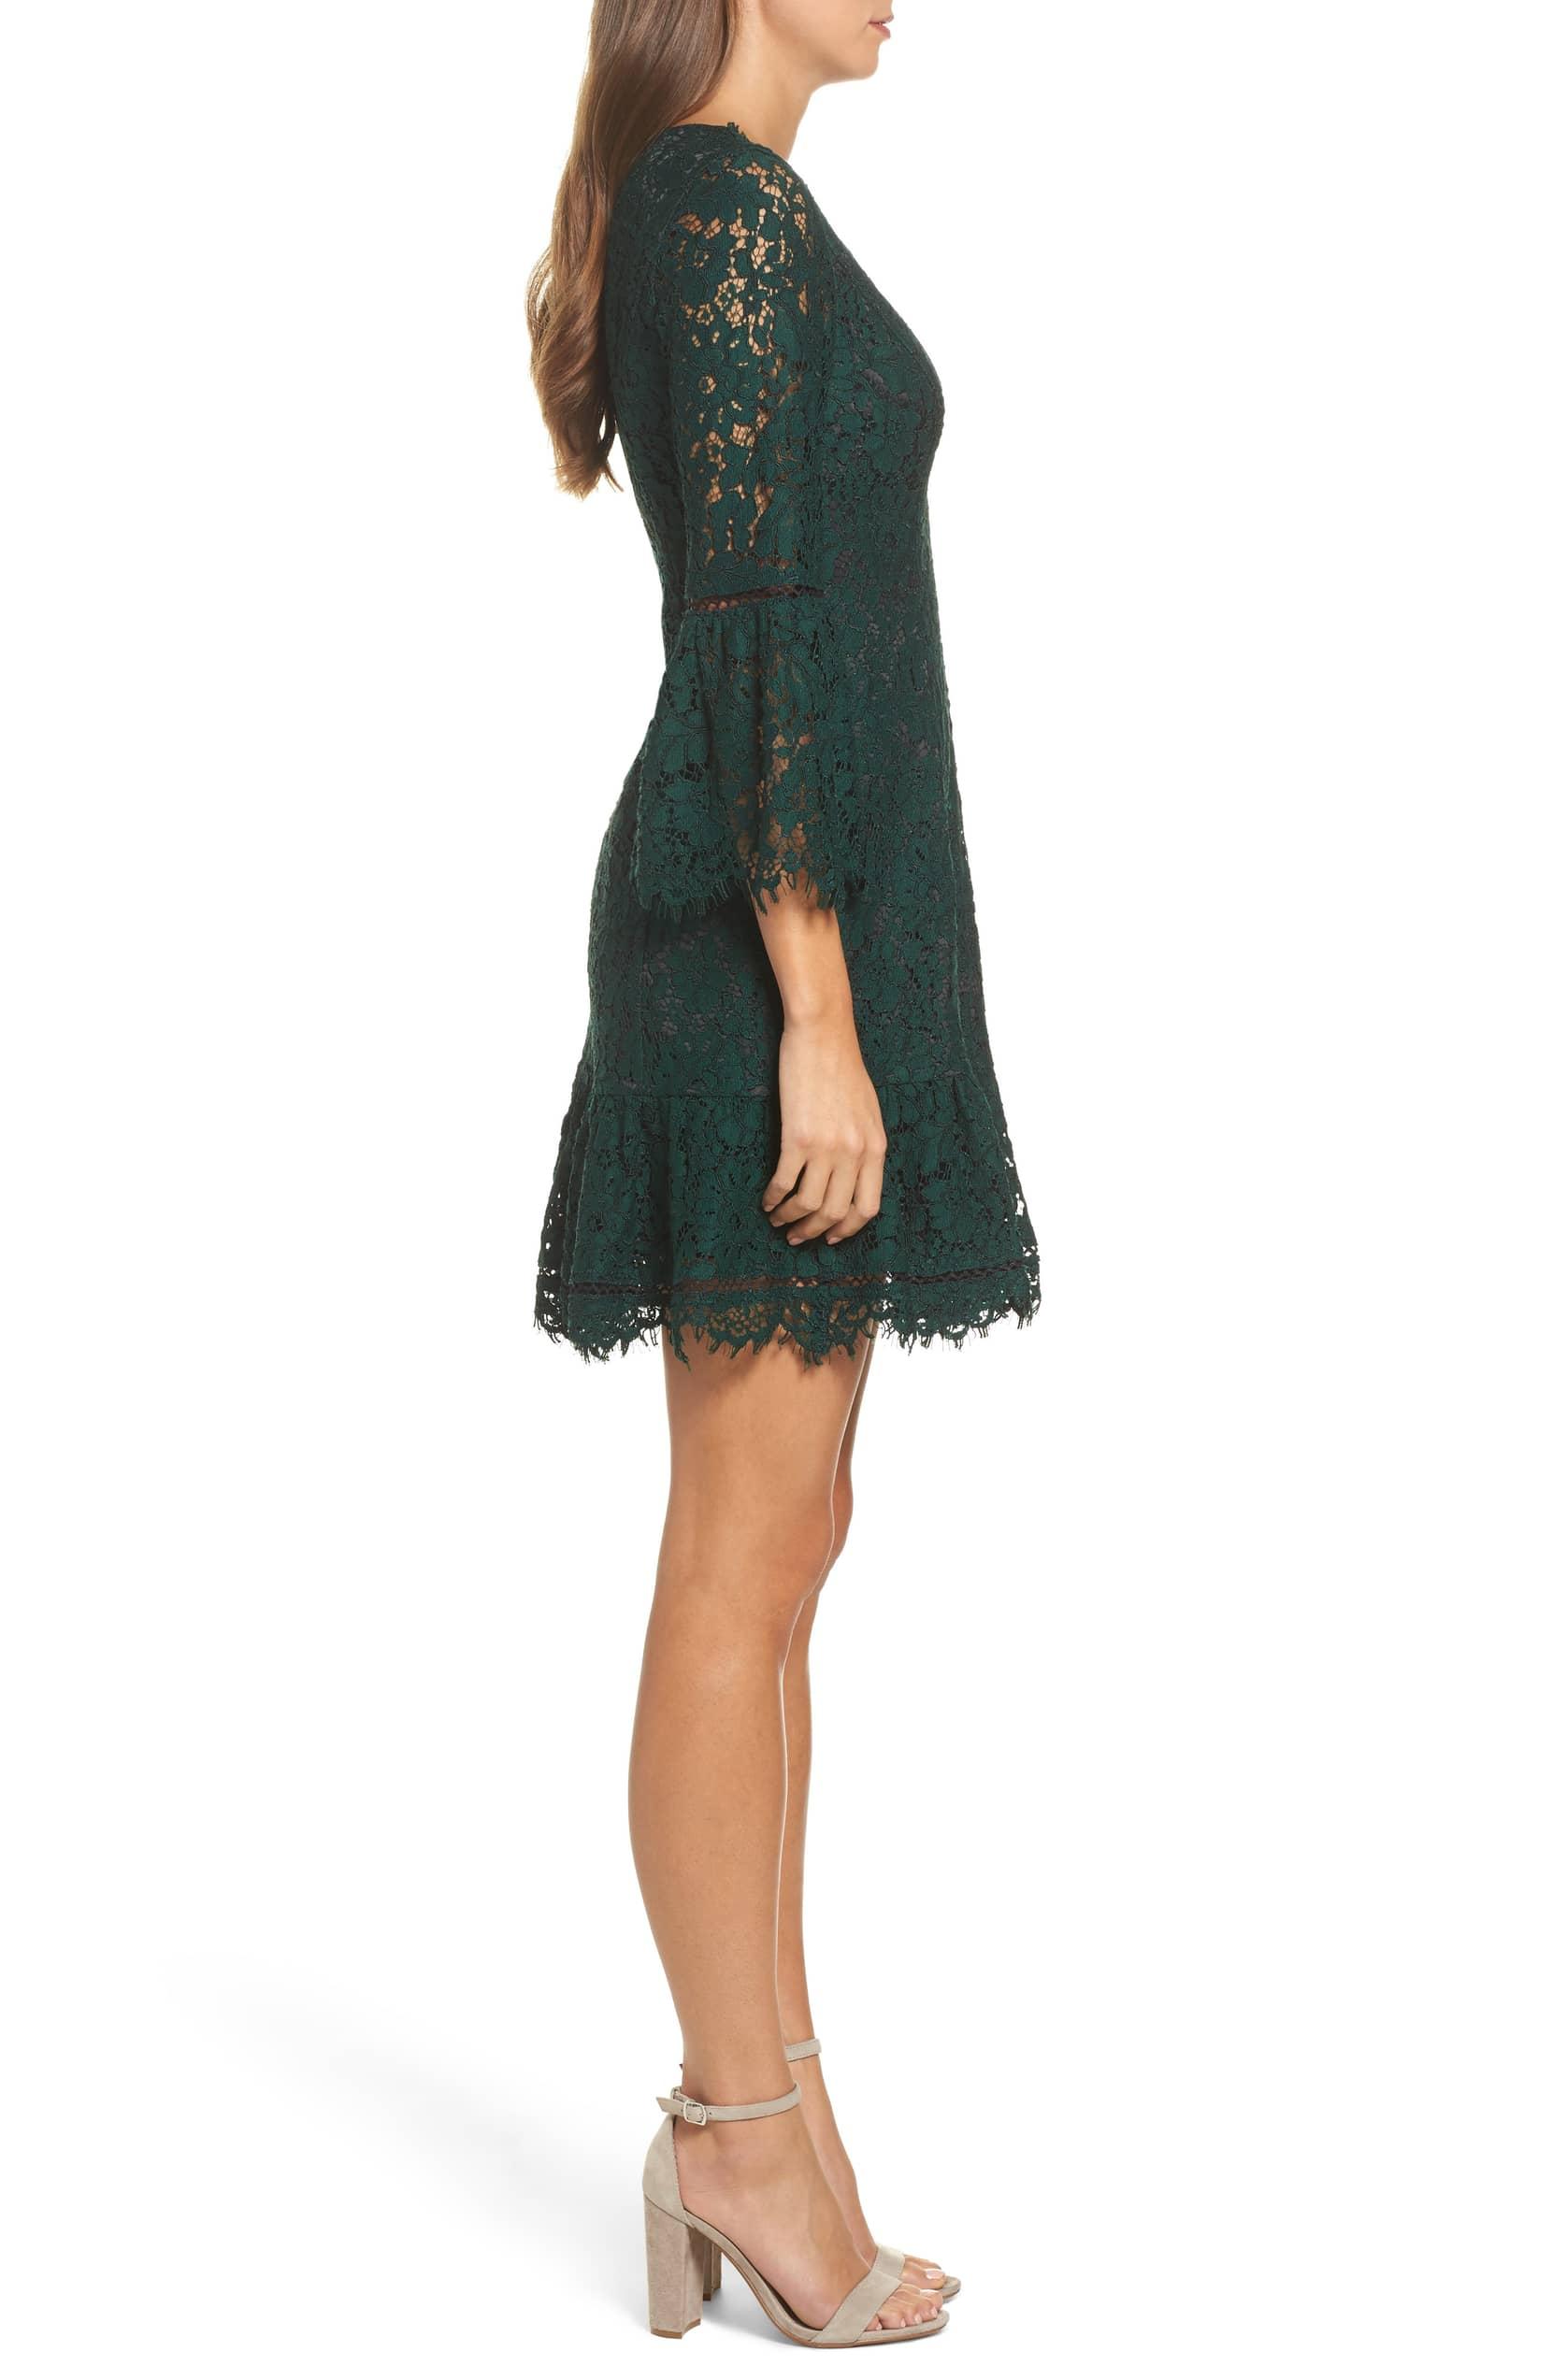 6c99b7381e ELIZA J Bell Sleeve Lace Green Dress - We Select Dresses